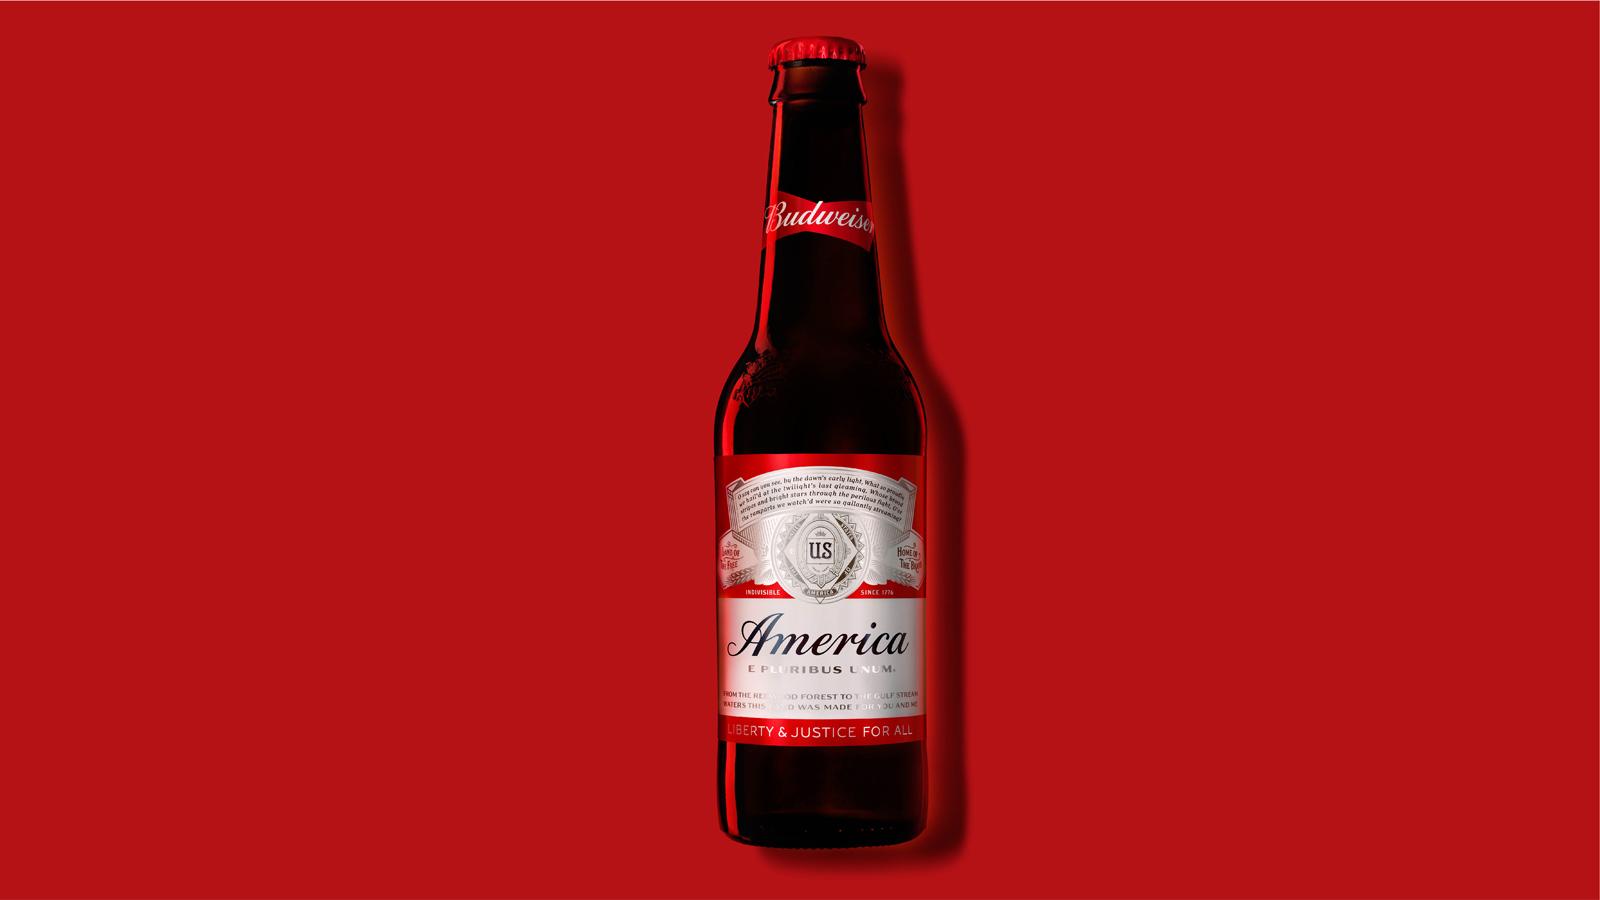 Budweiser America, A Curate's Egg